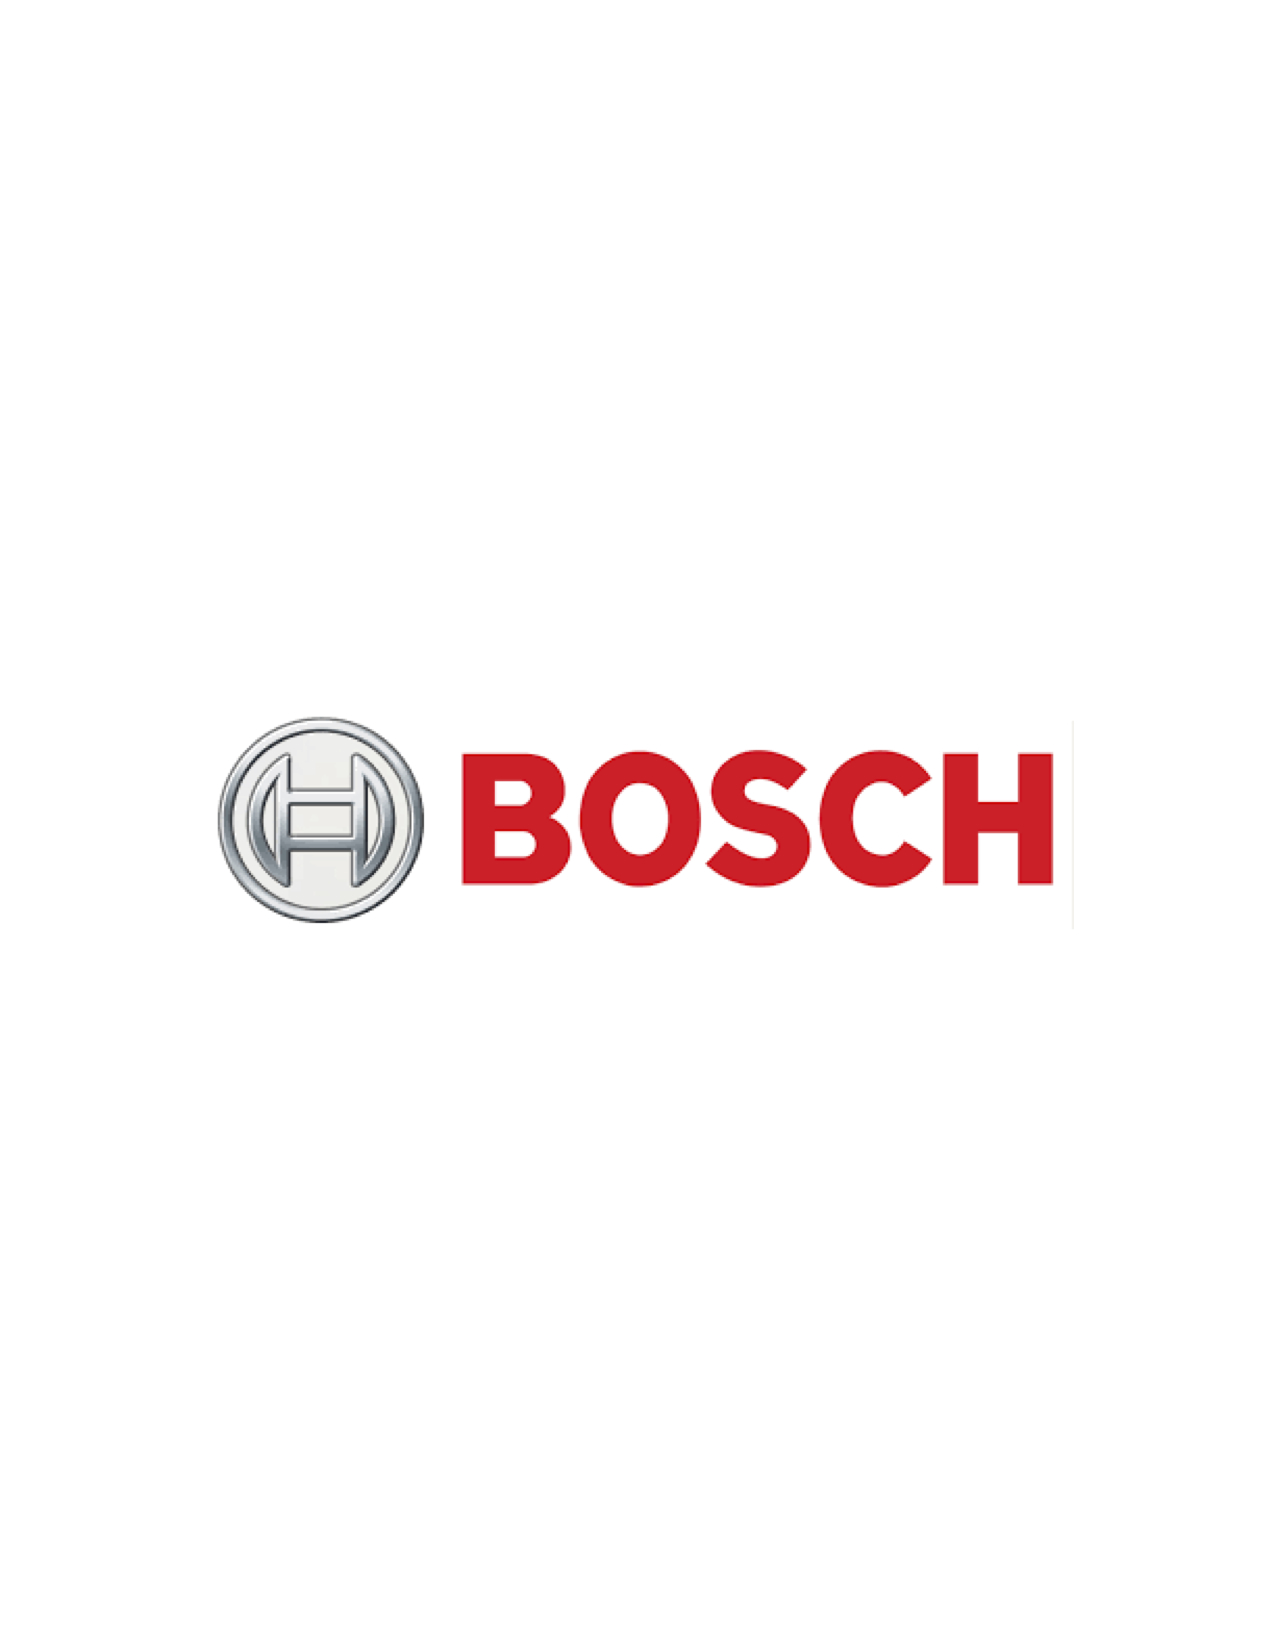 Bosch Elevator Componants